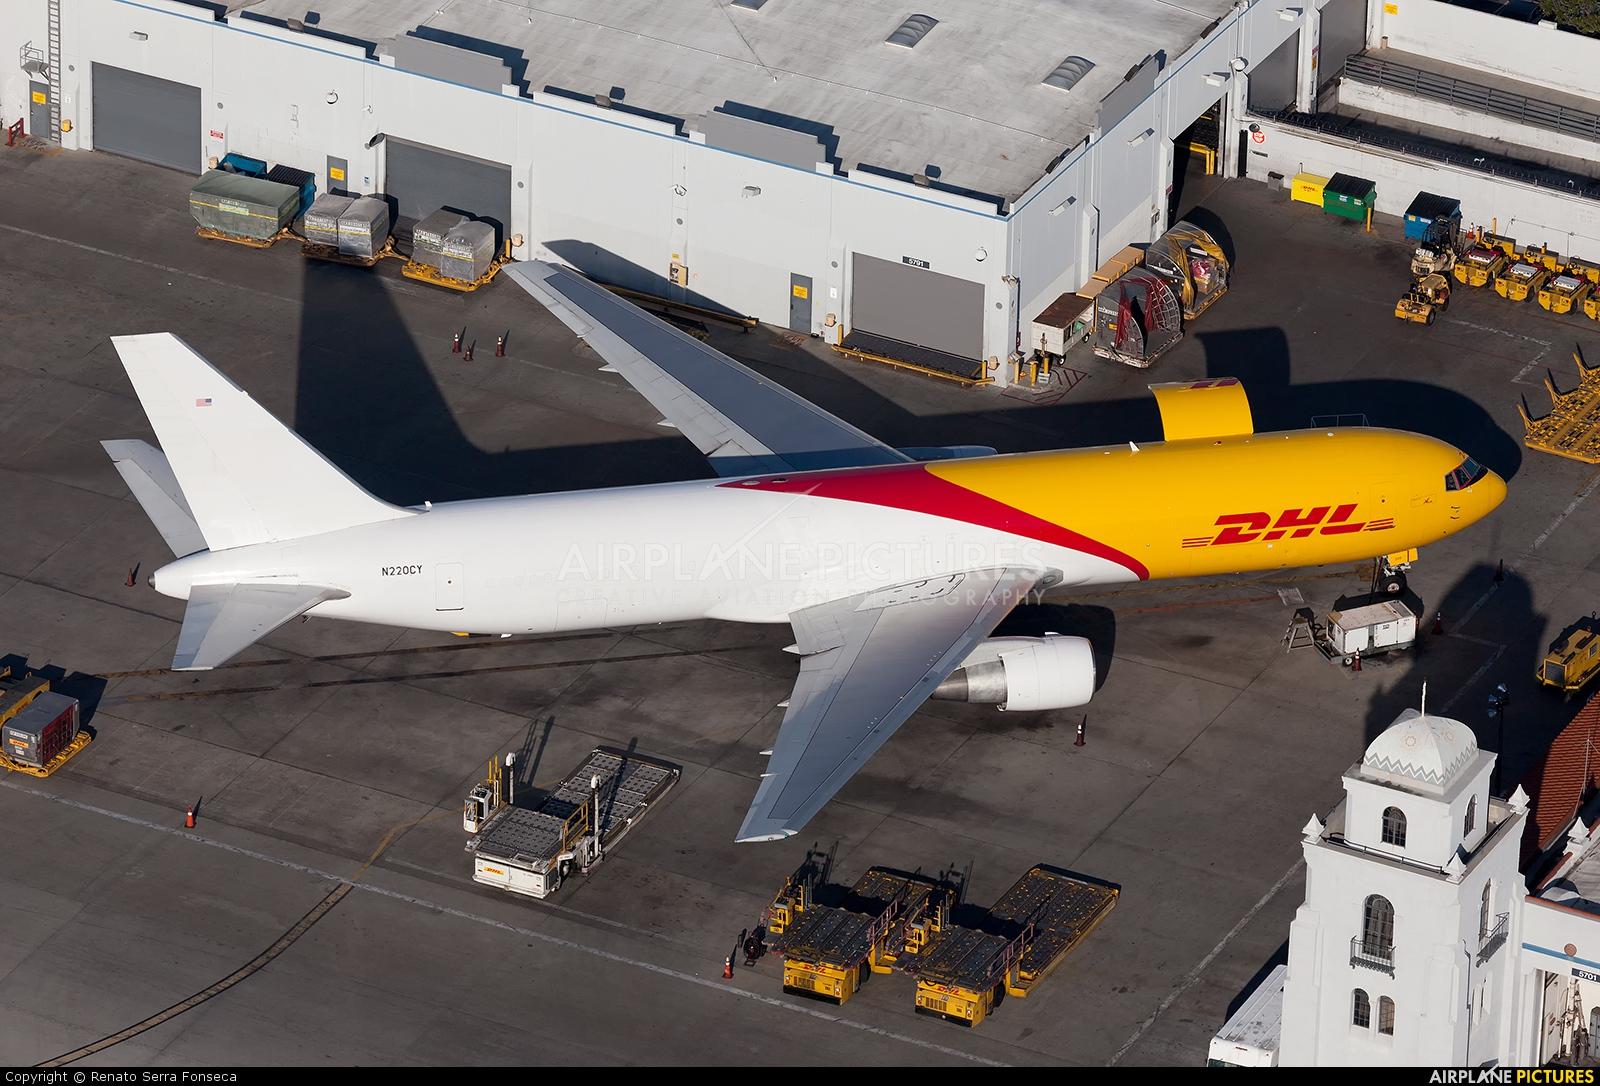 N220CY - DHL Cargo Boeing 767-300F at Los Angeles Intl